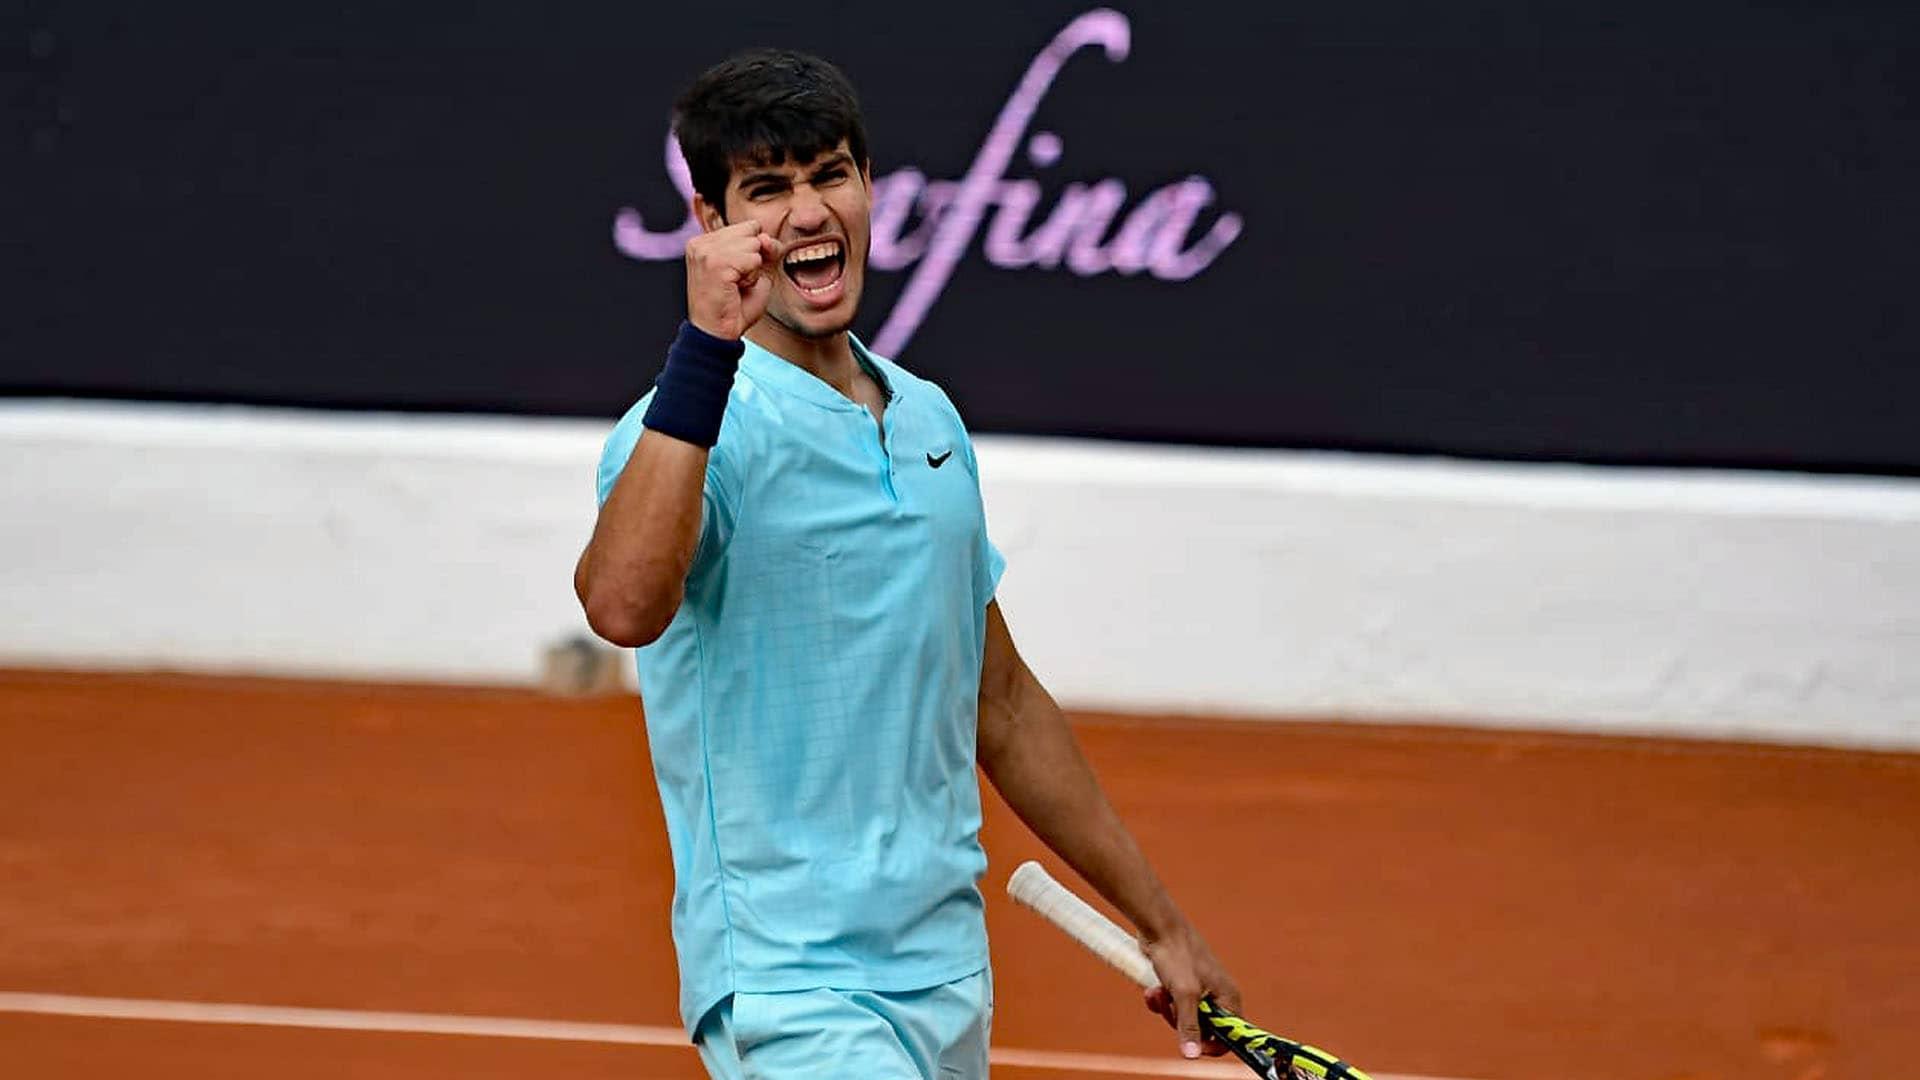 Barcelona Open 2021: Frances Tiafoe vs. Carlos Alcaraz Tennis Pick and Prediction